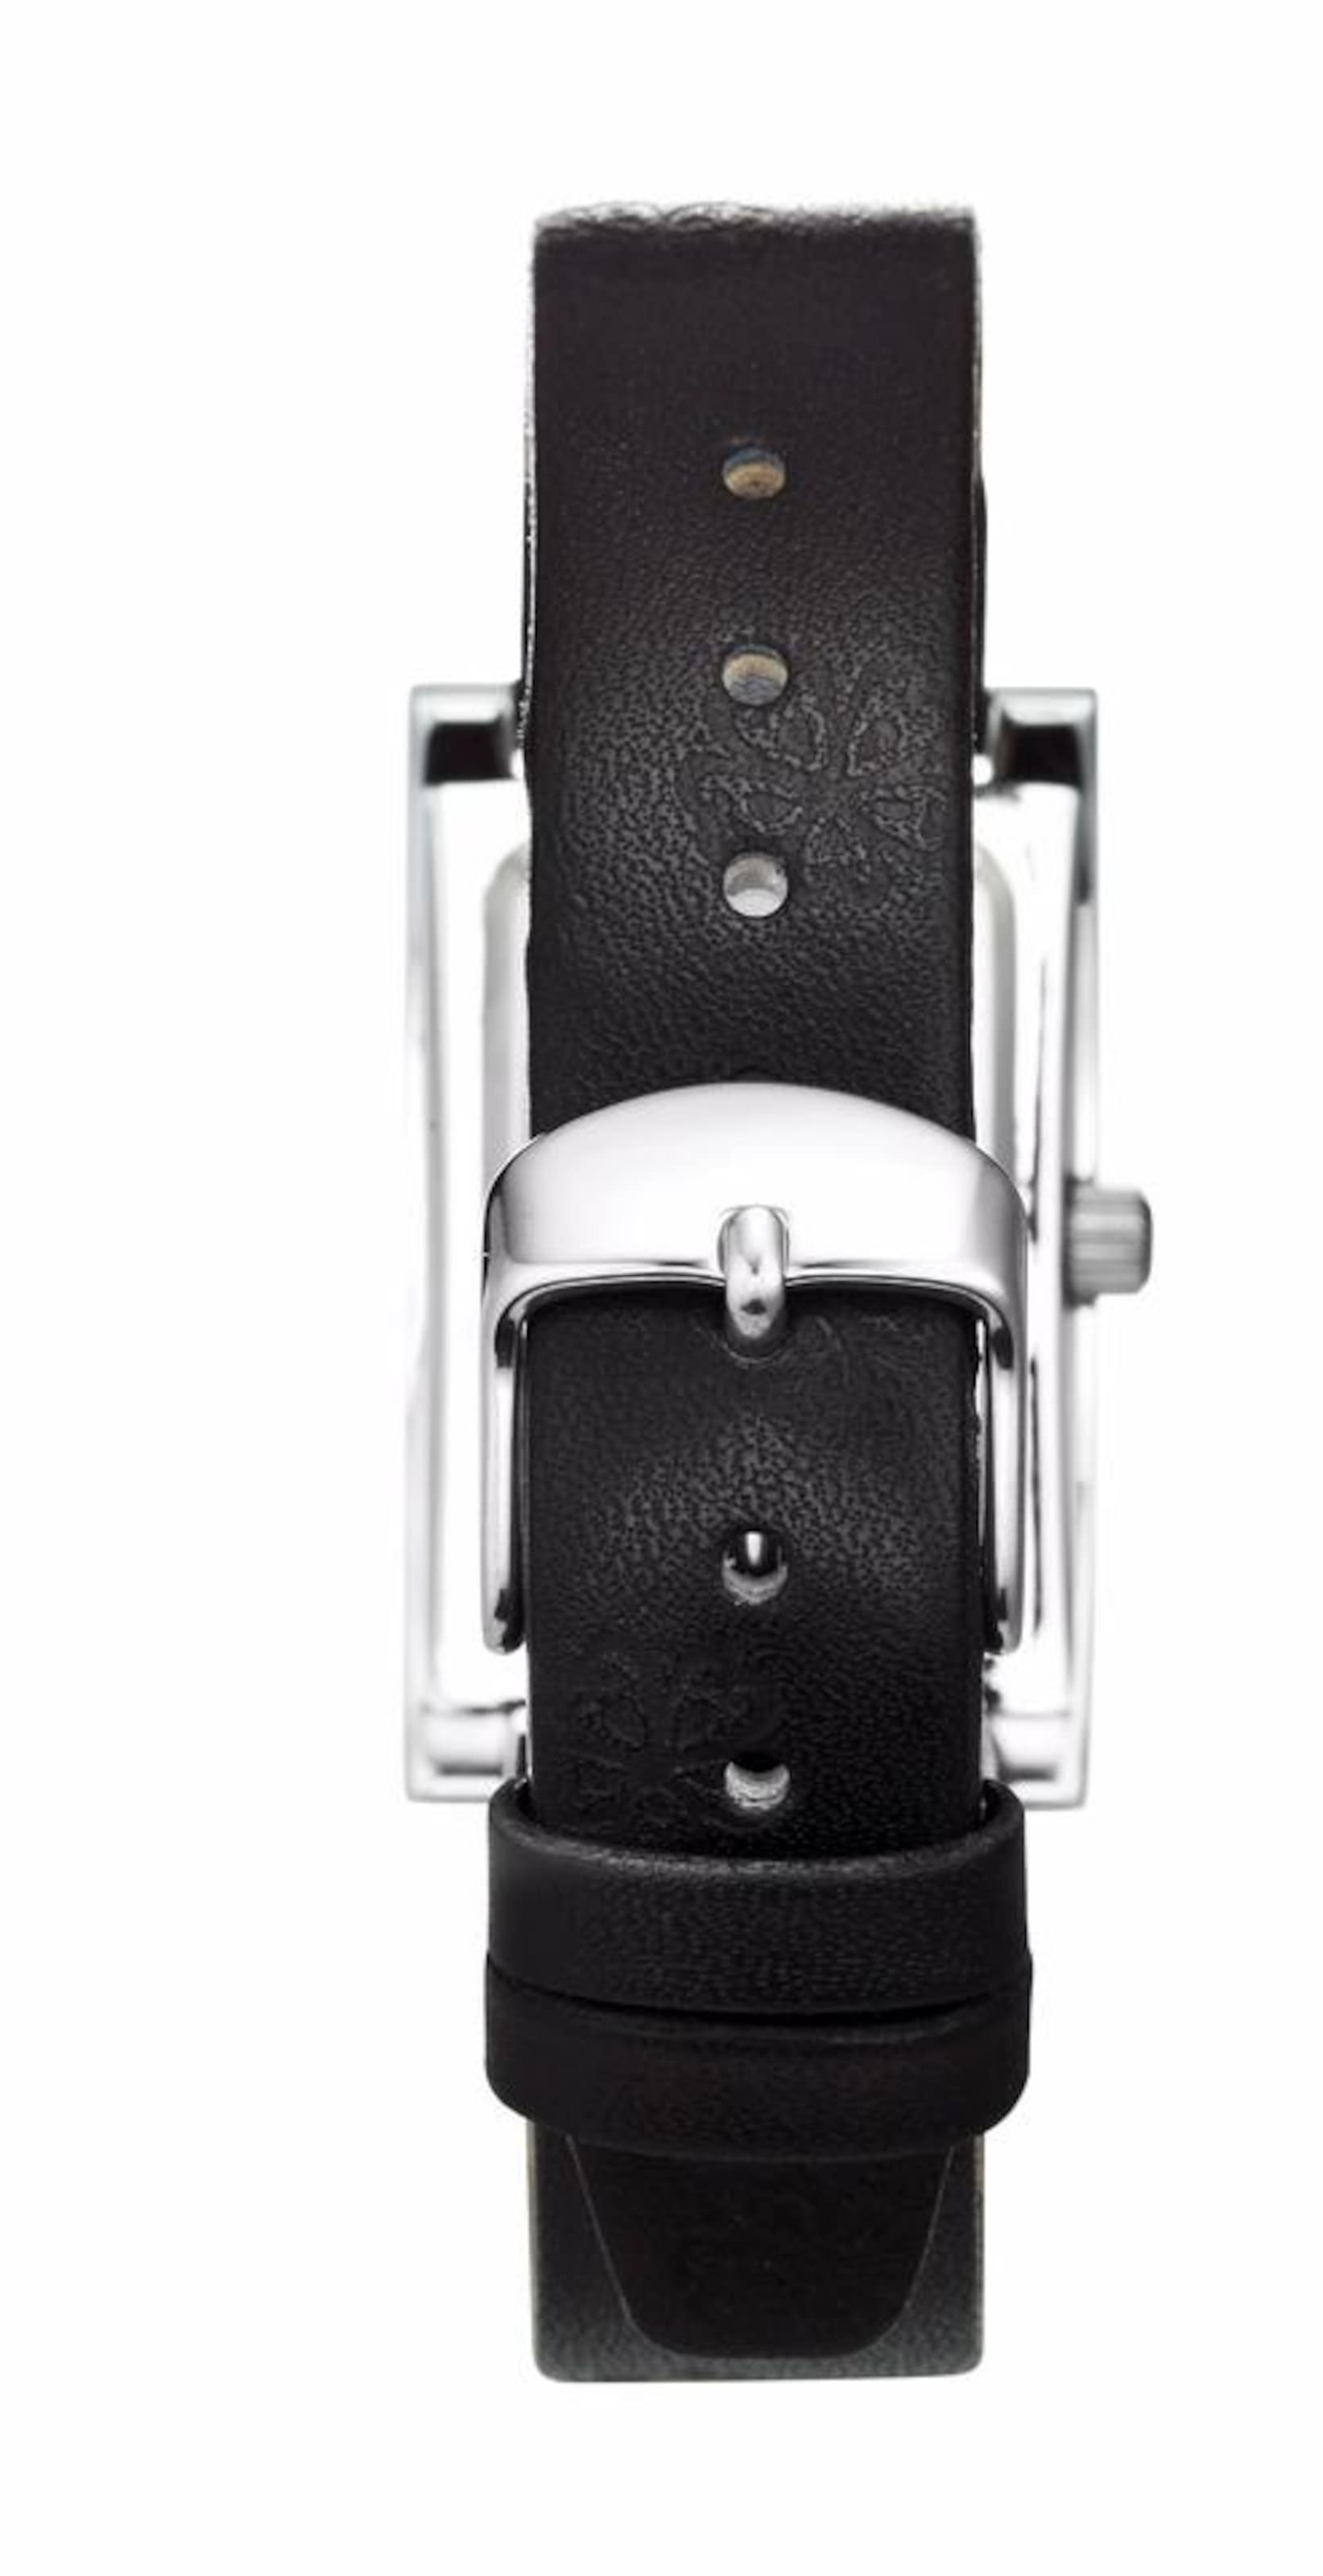 BUFFALO Buffalo Quarzuhr Freies Verschiffen Billig Qualität Billig Verkauf Verkauf Modestil 8haT1xwDs